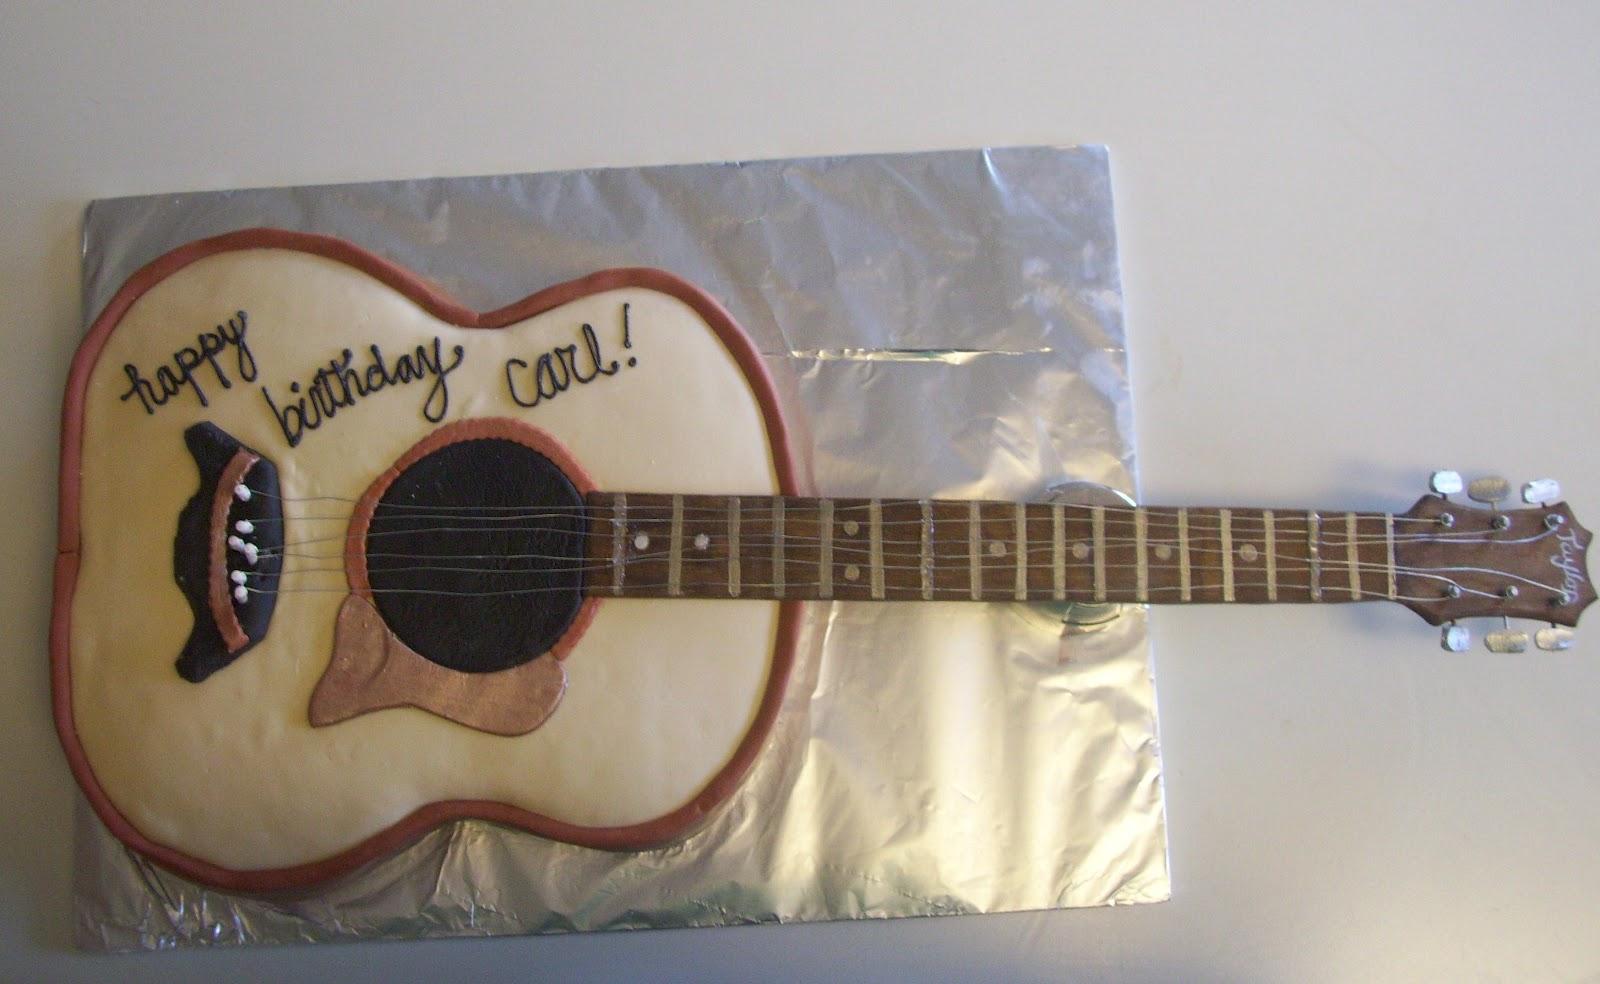 Spatula City Cakes: Classic Rock